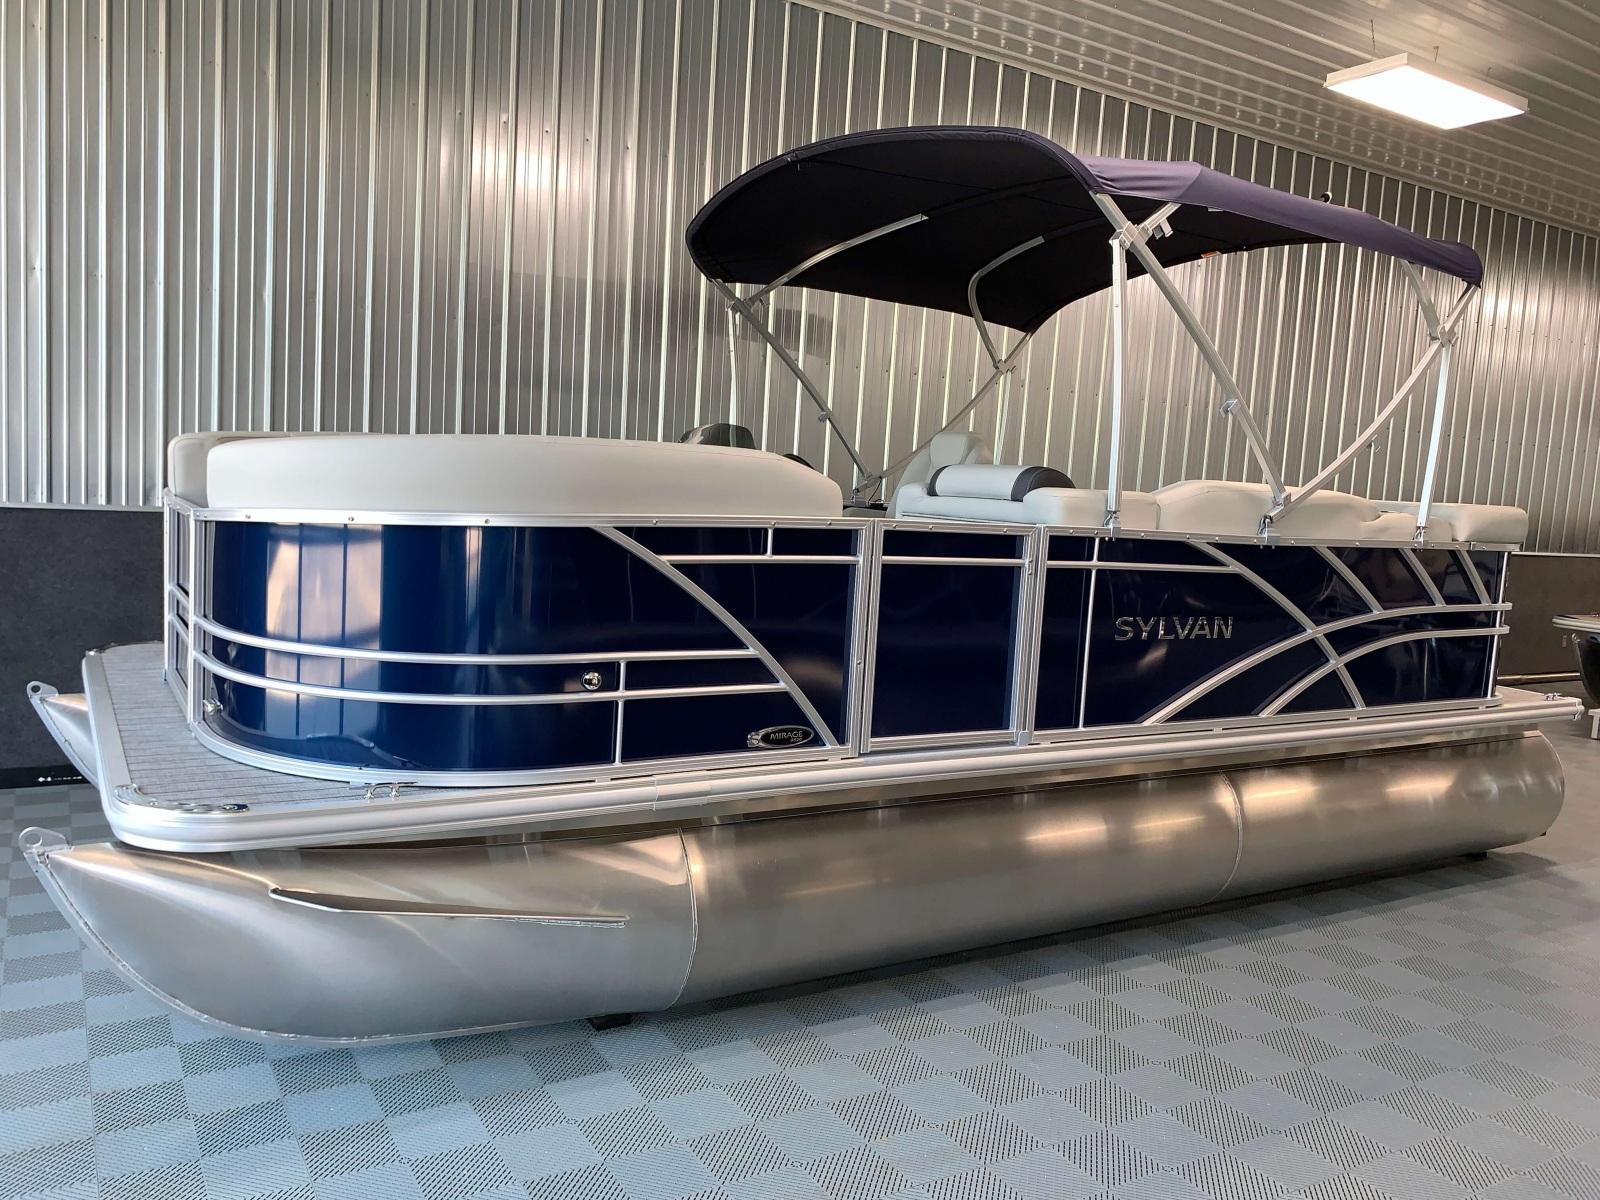 D-Rail Panel Design of a 2021 Sylvan Mirage 8520 Cruise Pontoon Boat